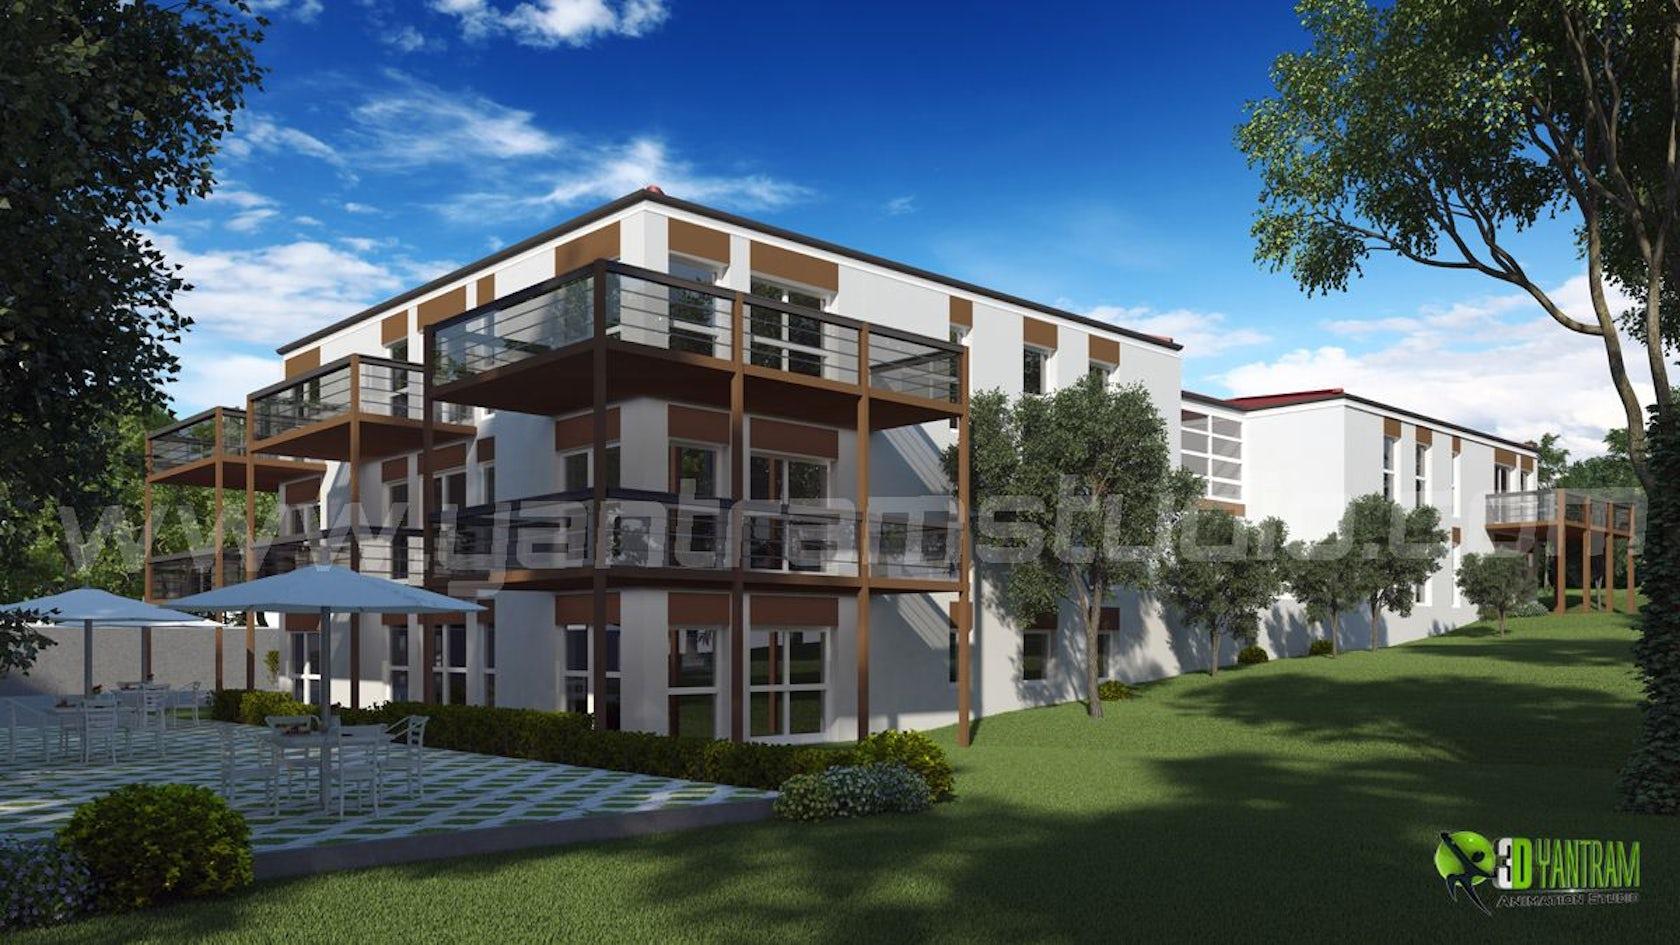 Exterior: 3D Exterior Residential Rendering Design